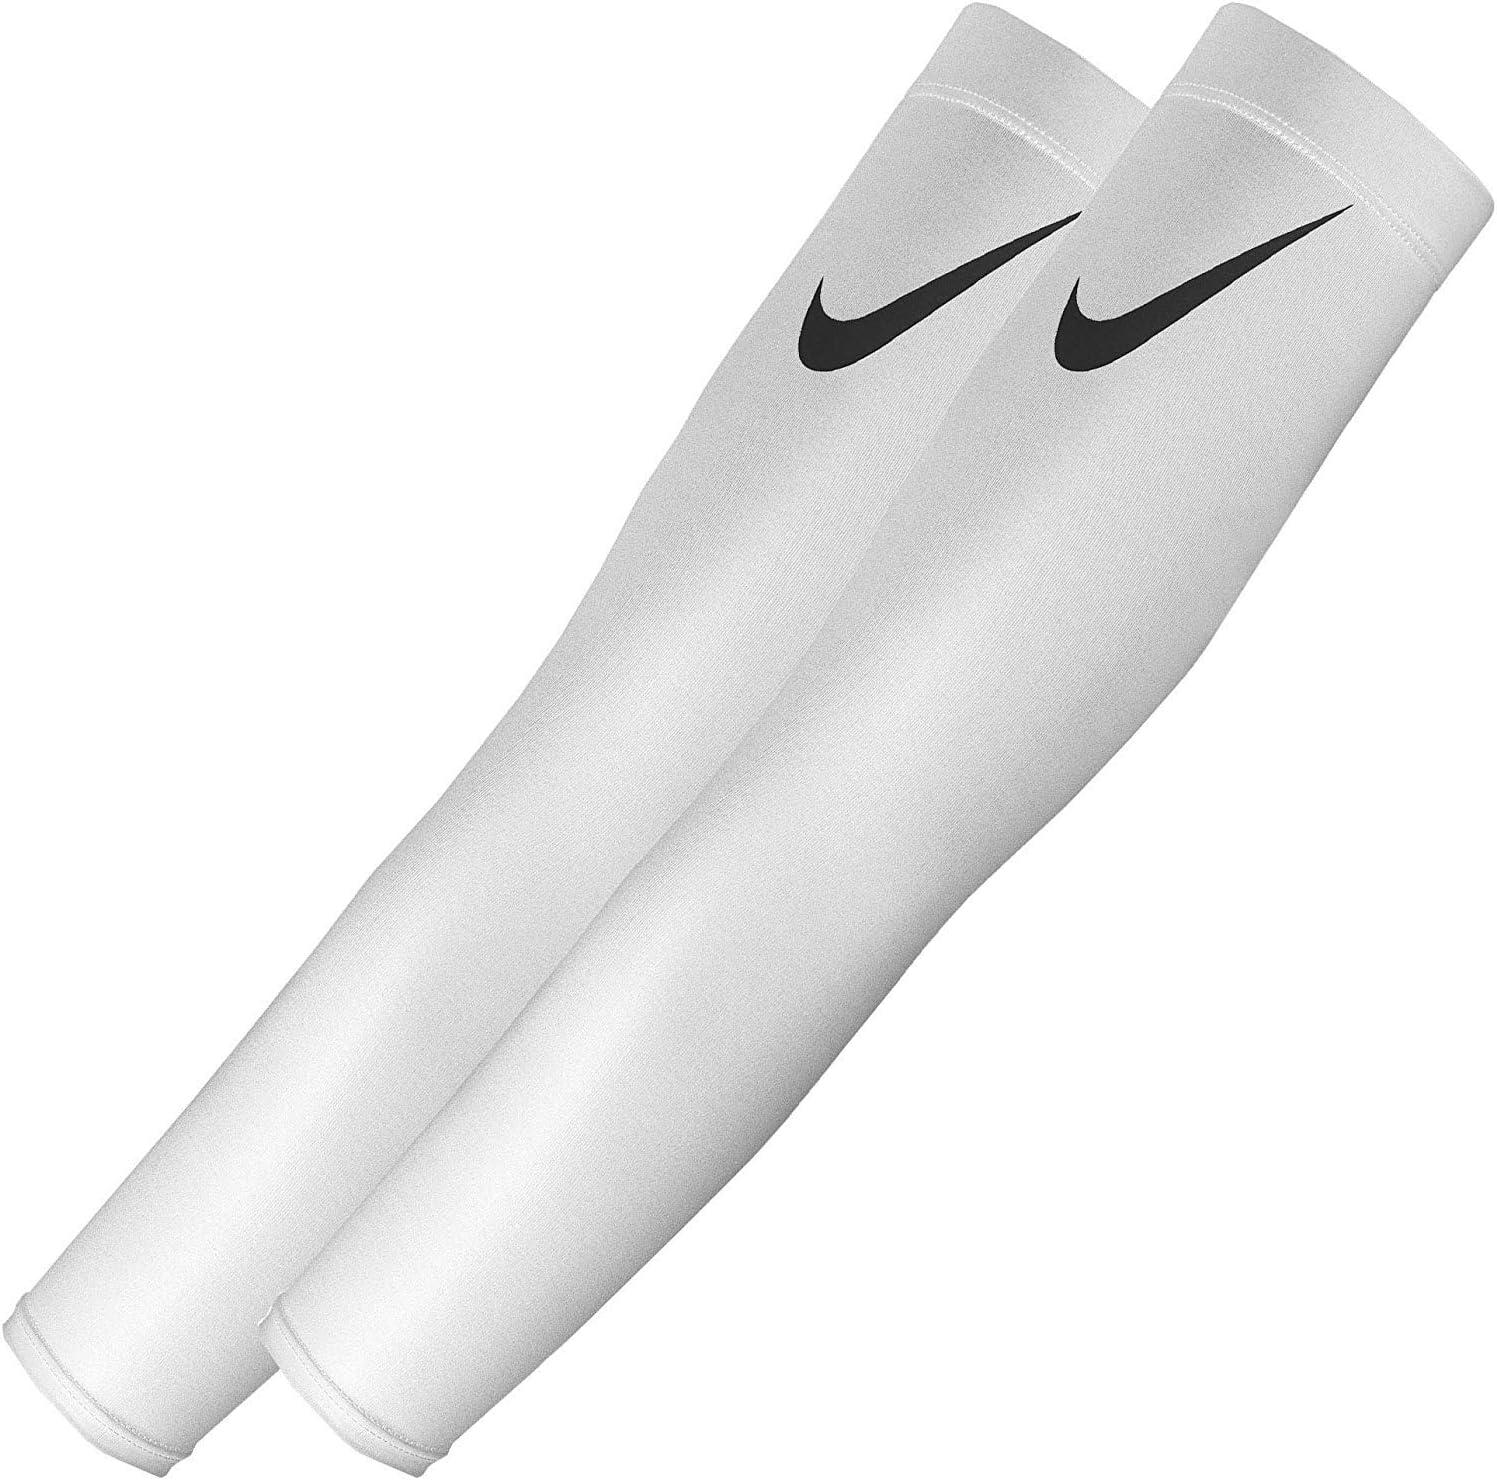 Nike Pro Dri Fit Sleeve 4.0 Black Max 89% OFF White 1 year warranty M S